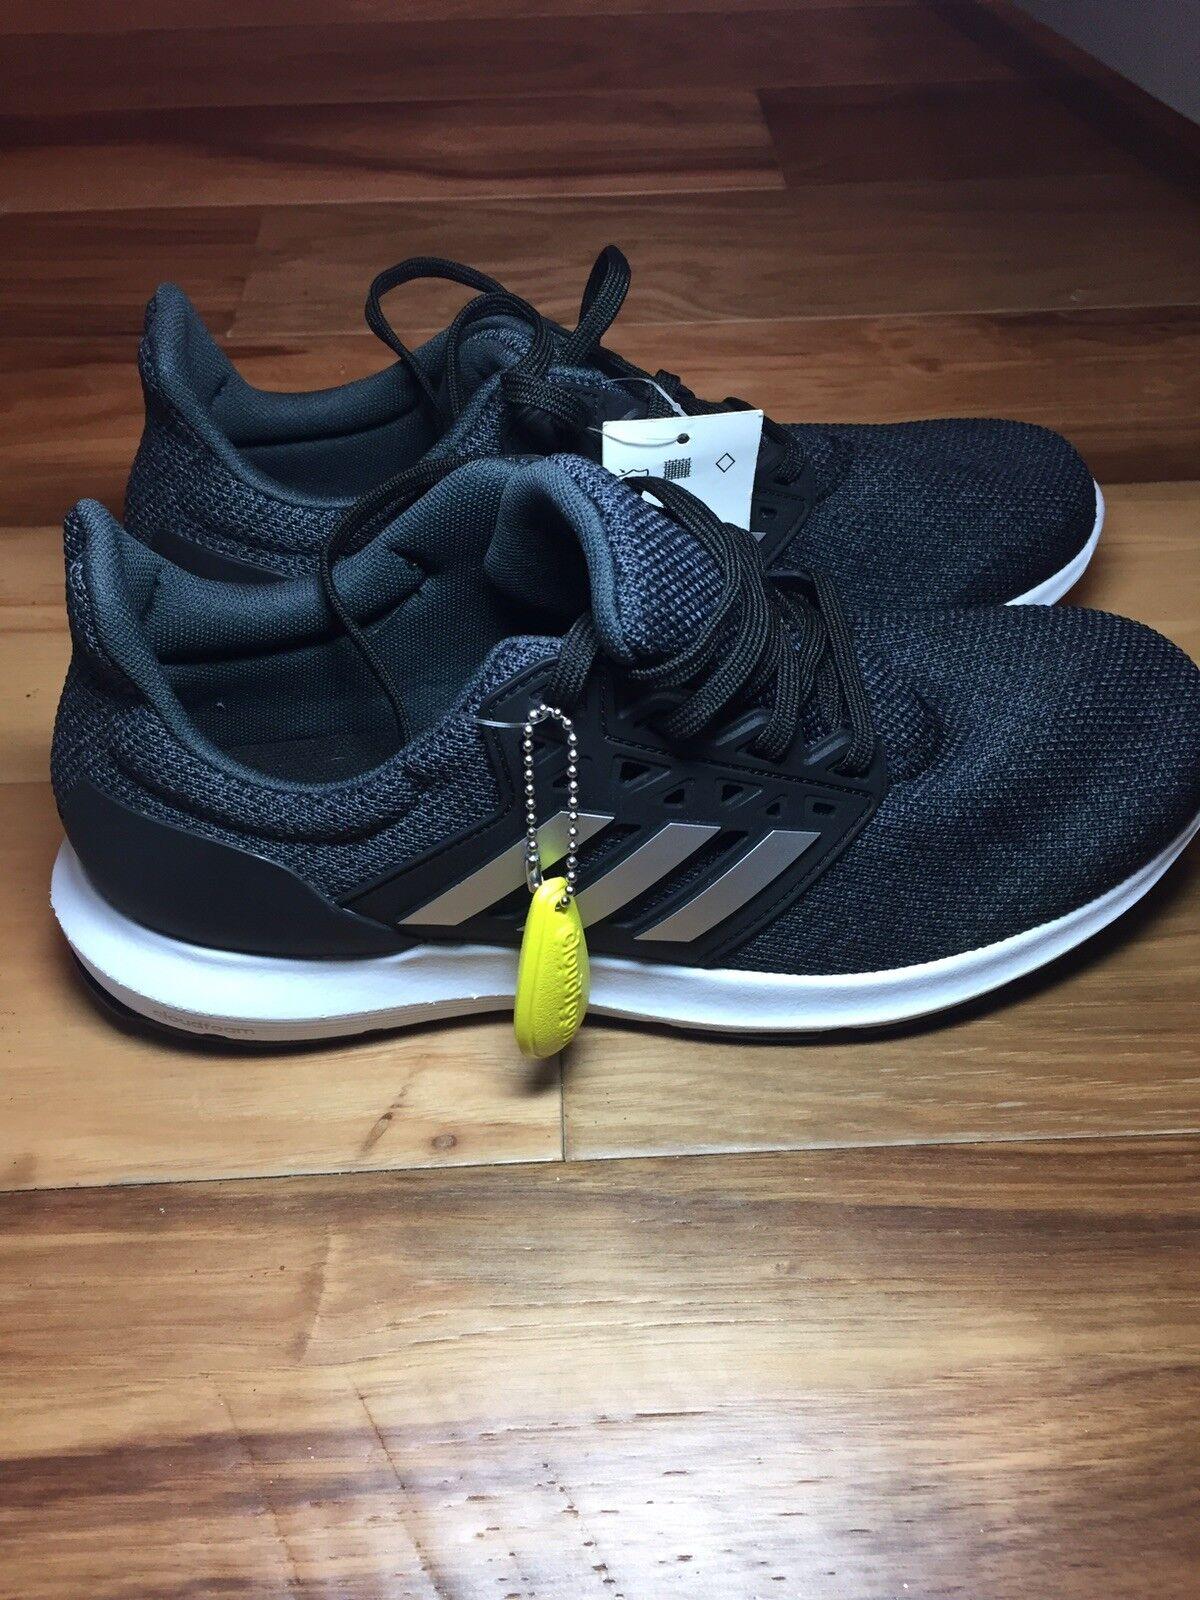 Adidas Women Solyx B43724 Running Sneaker shoes Black Silver Carbon Size 8.5 NIB